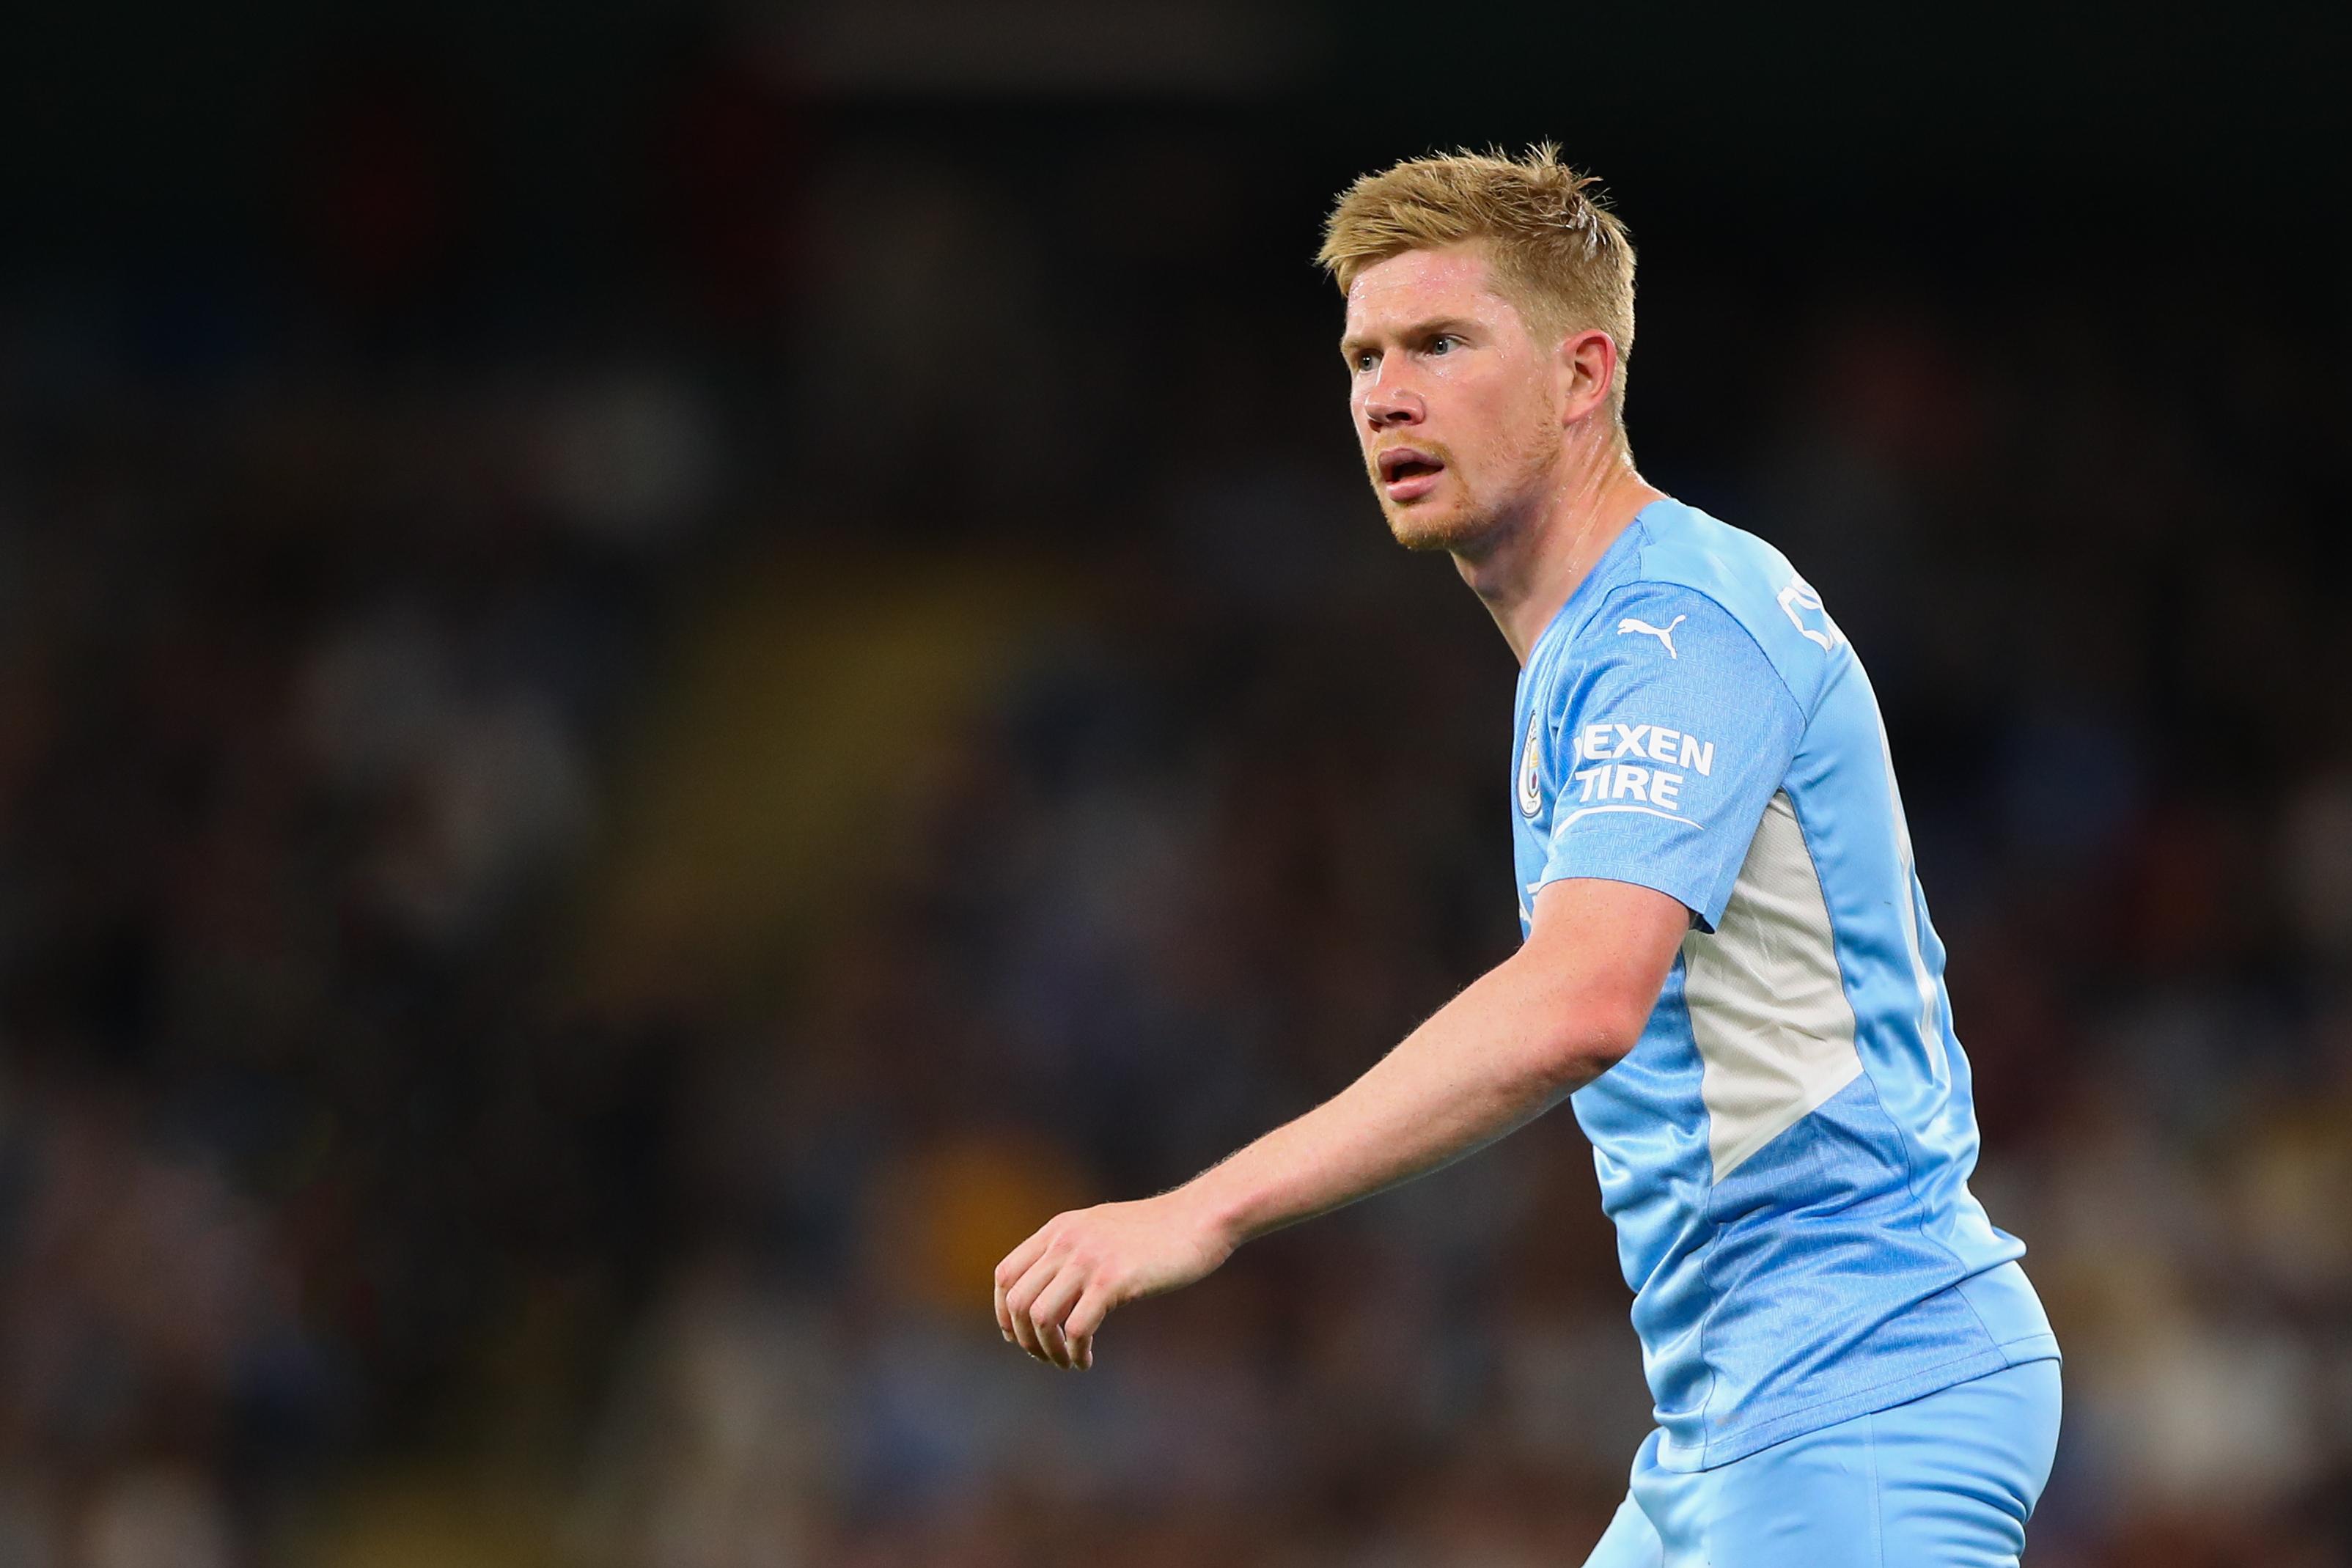 Southampton, Manchester City, team news, injury list, update, Premier League, FPL, Kevin De Bruyne, Phil Foden, Aymeric Laporte, John Stones